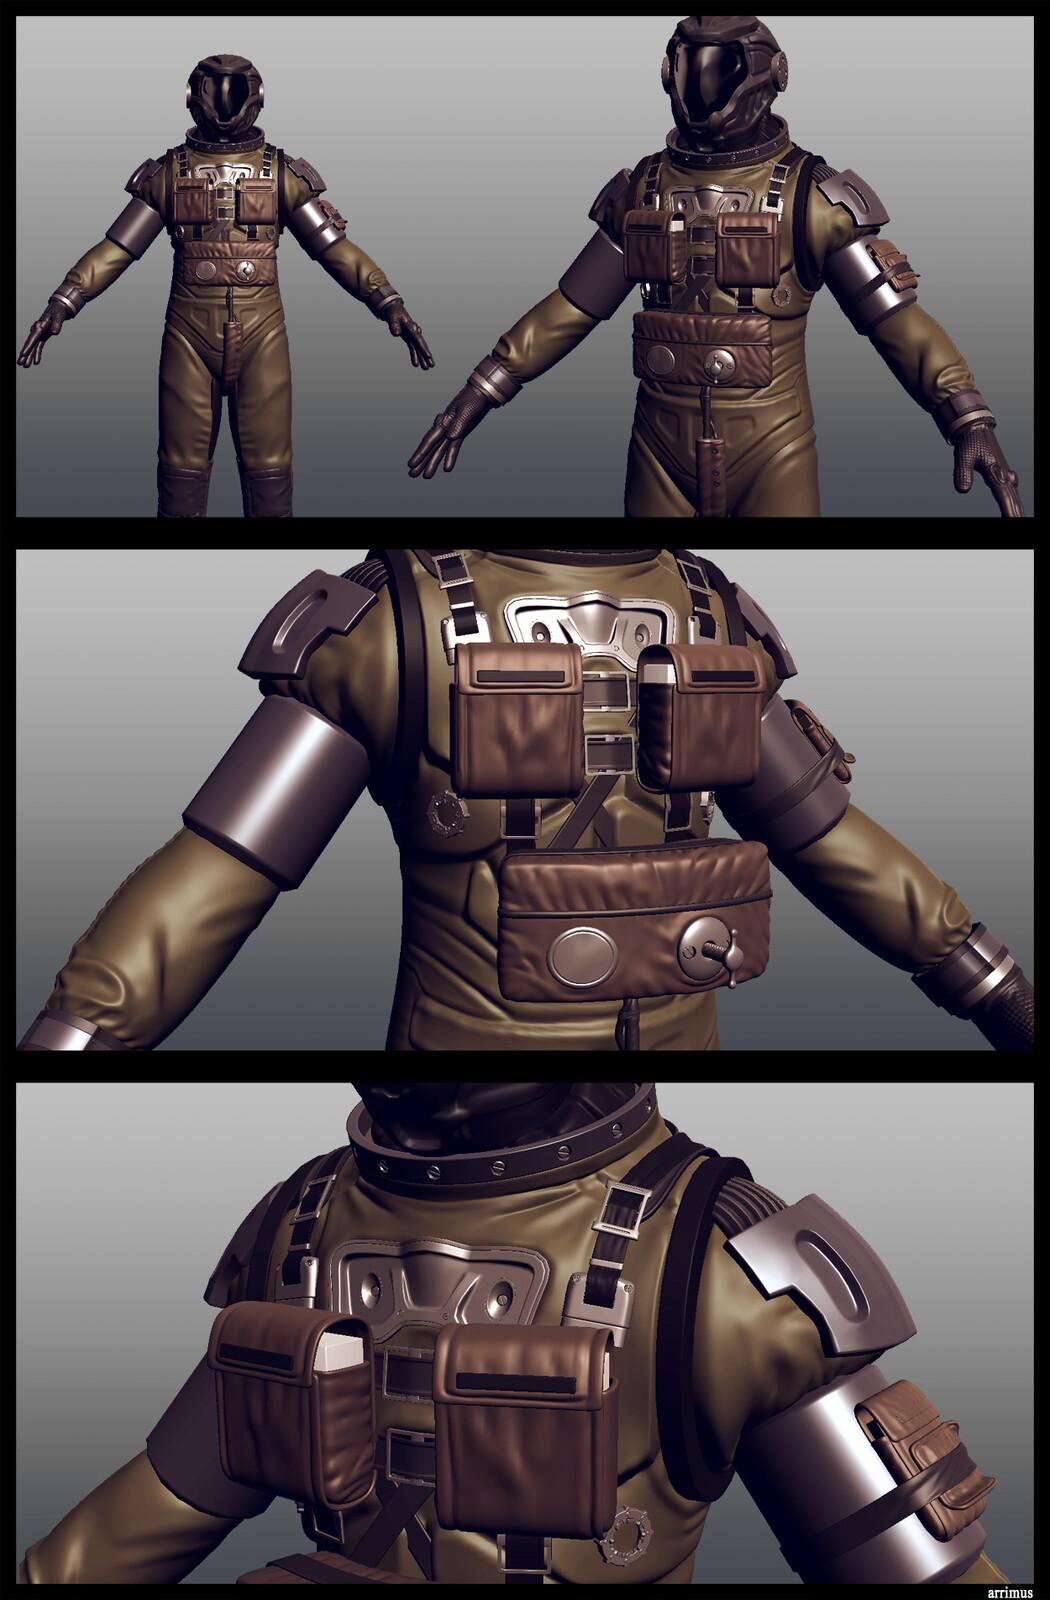 Space suit. That shoulder pad though.